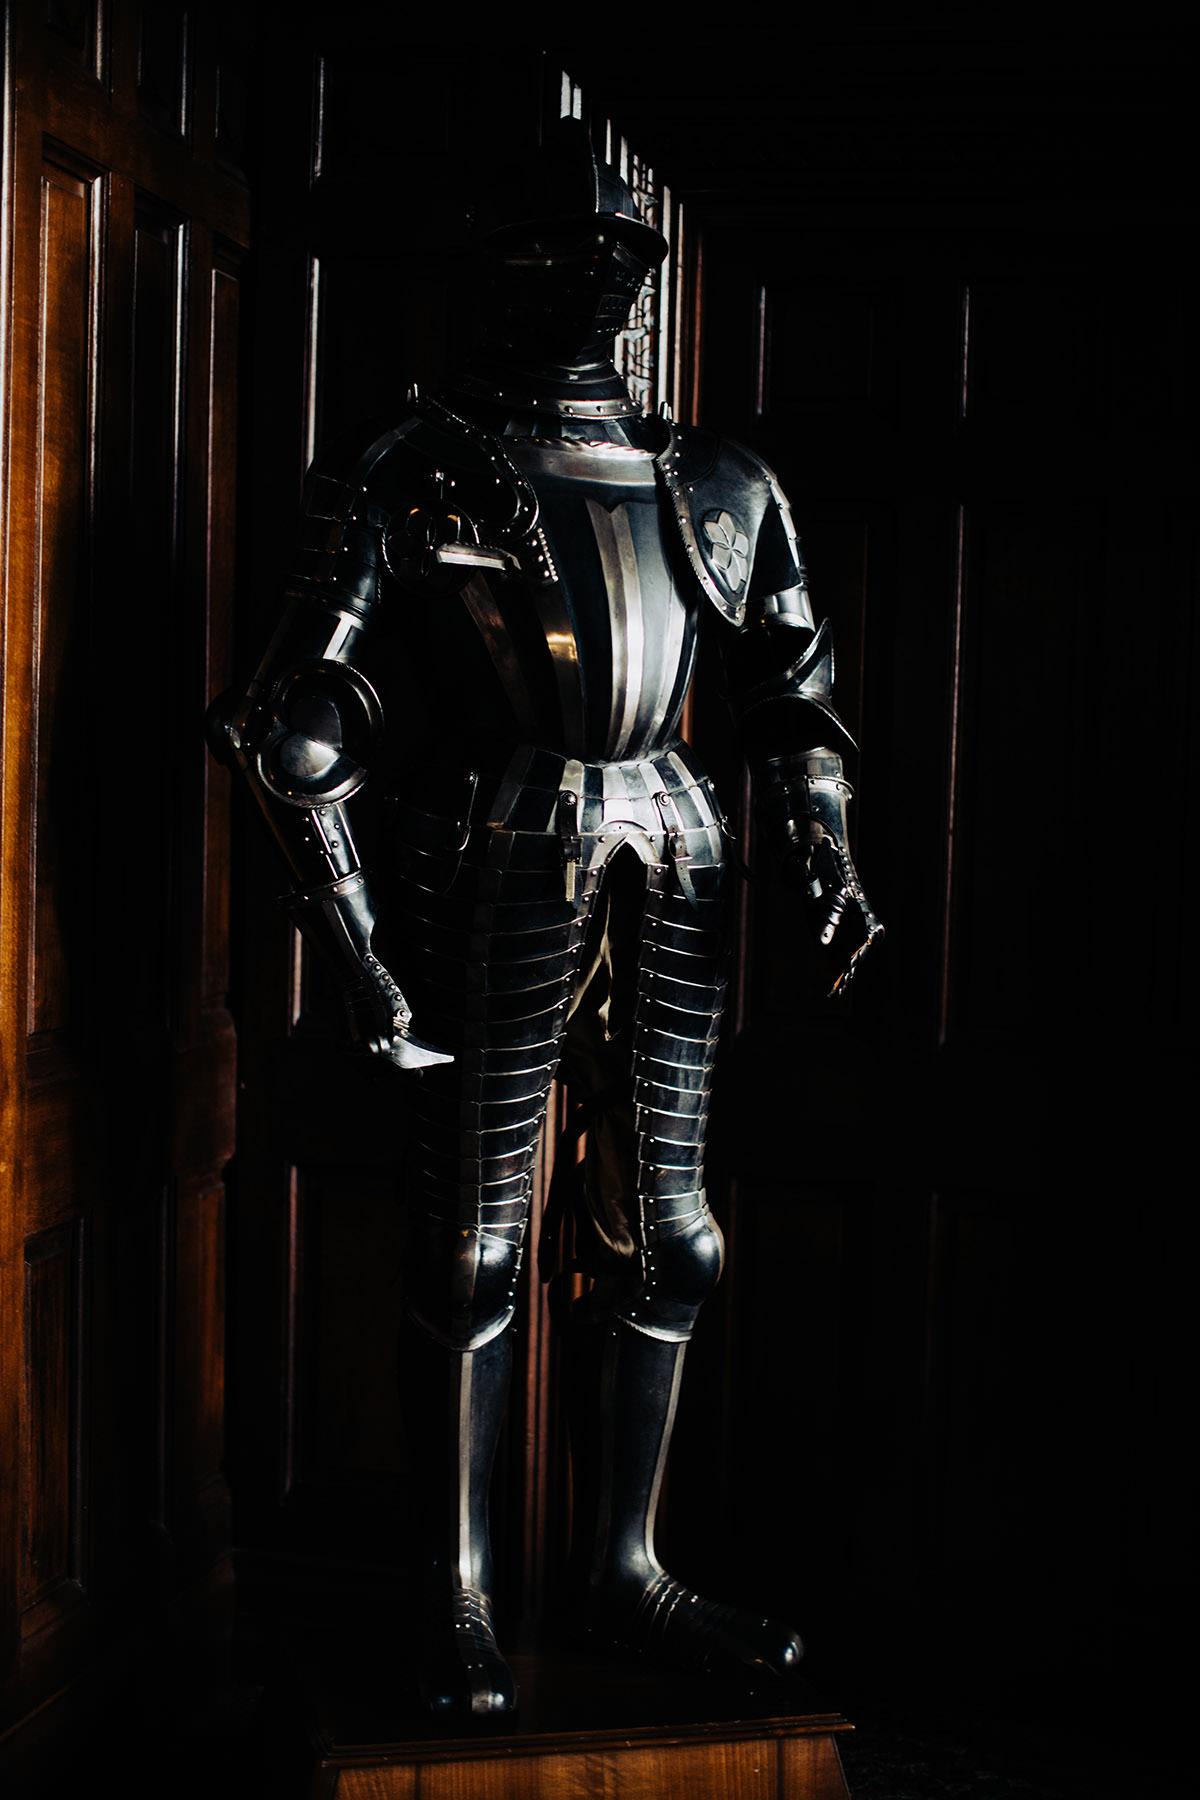 armour-ashford-castle-ireland-3.jpg